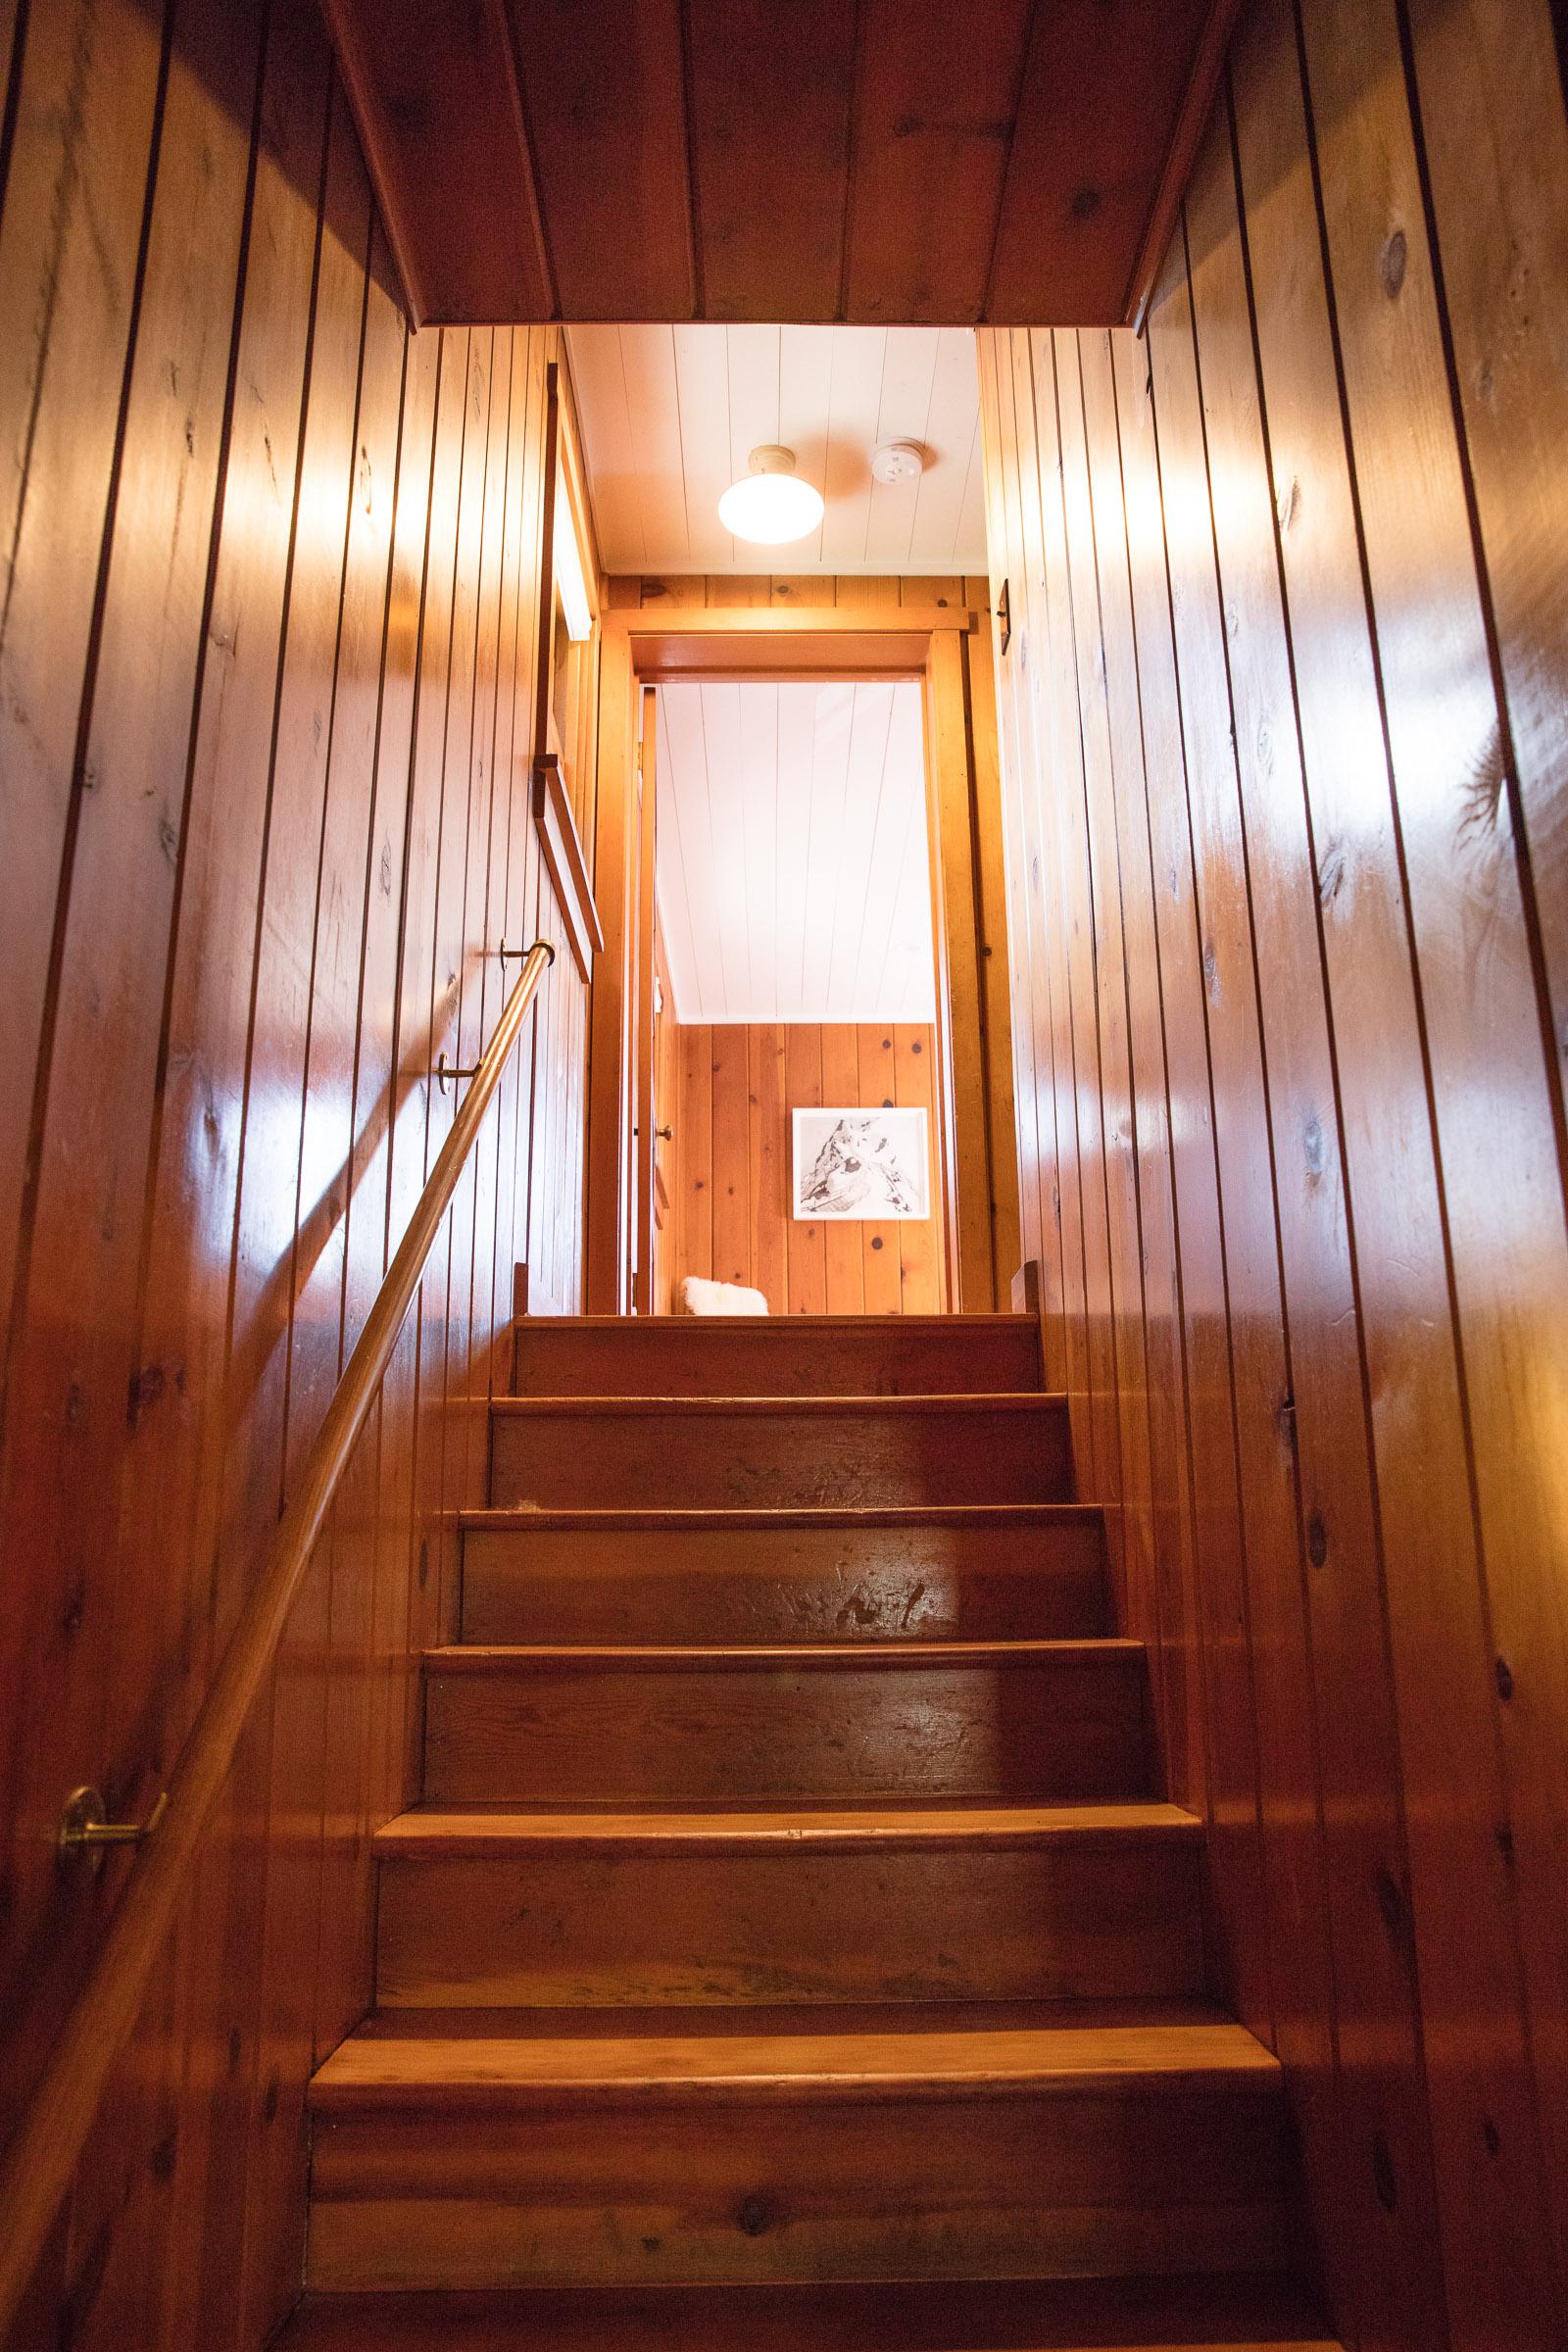 Going upstairs.